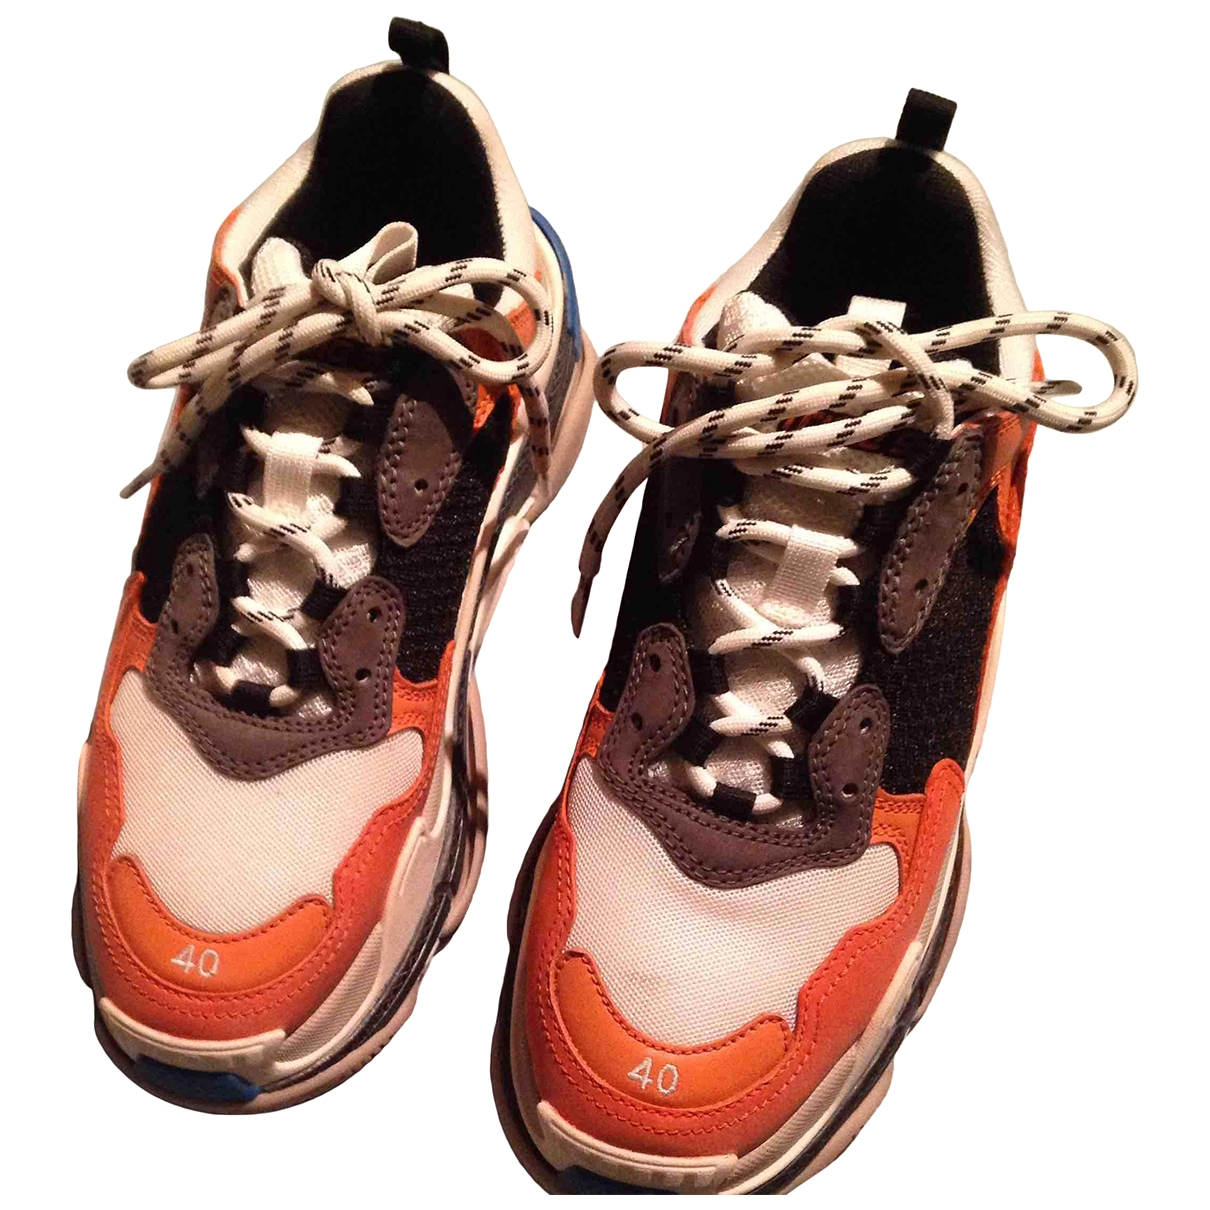 Balenciaga - Baskets Triple S pour femme en cuir